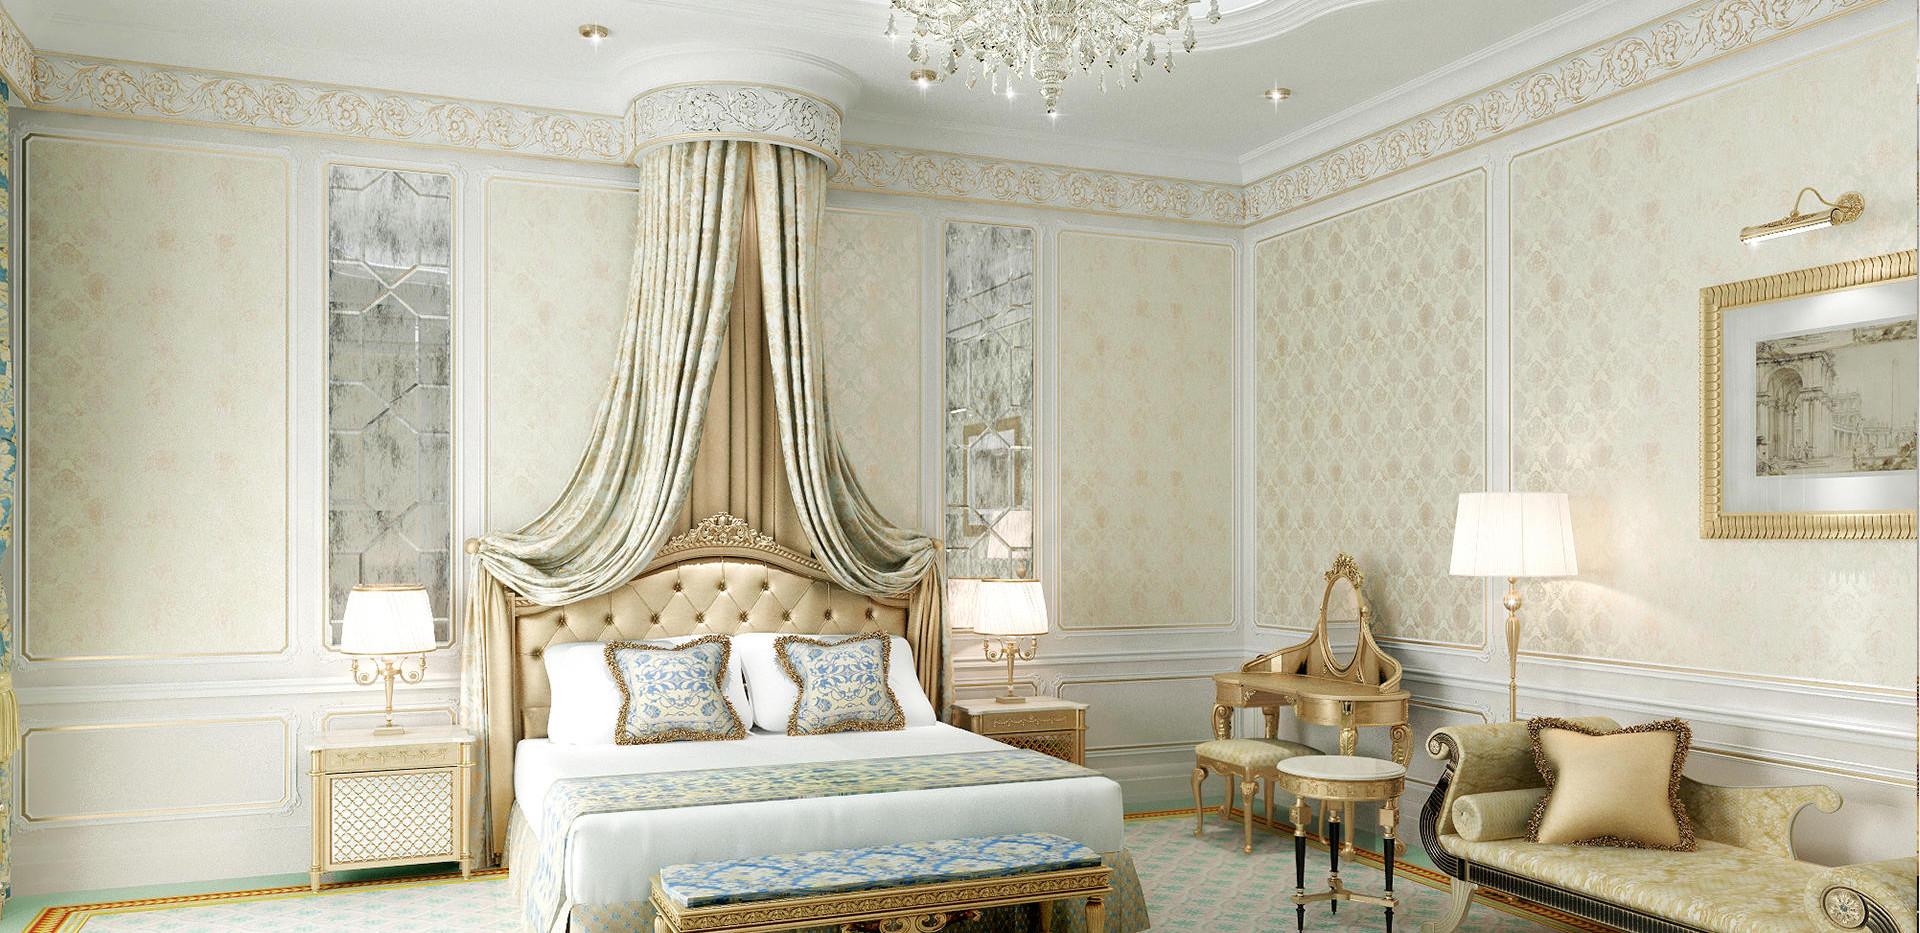 Emerald_Palace_Kempinski_Dubai-President